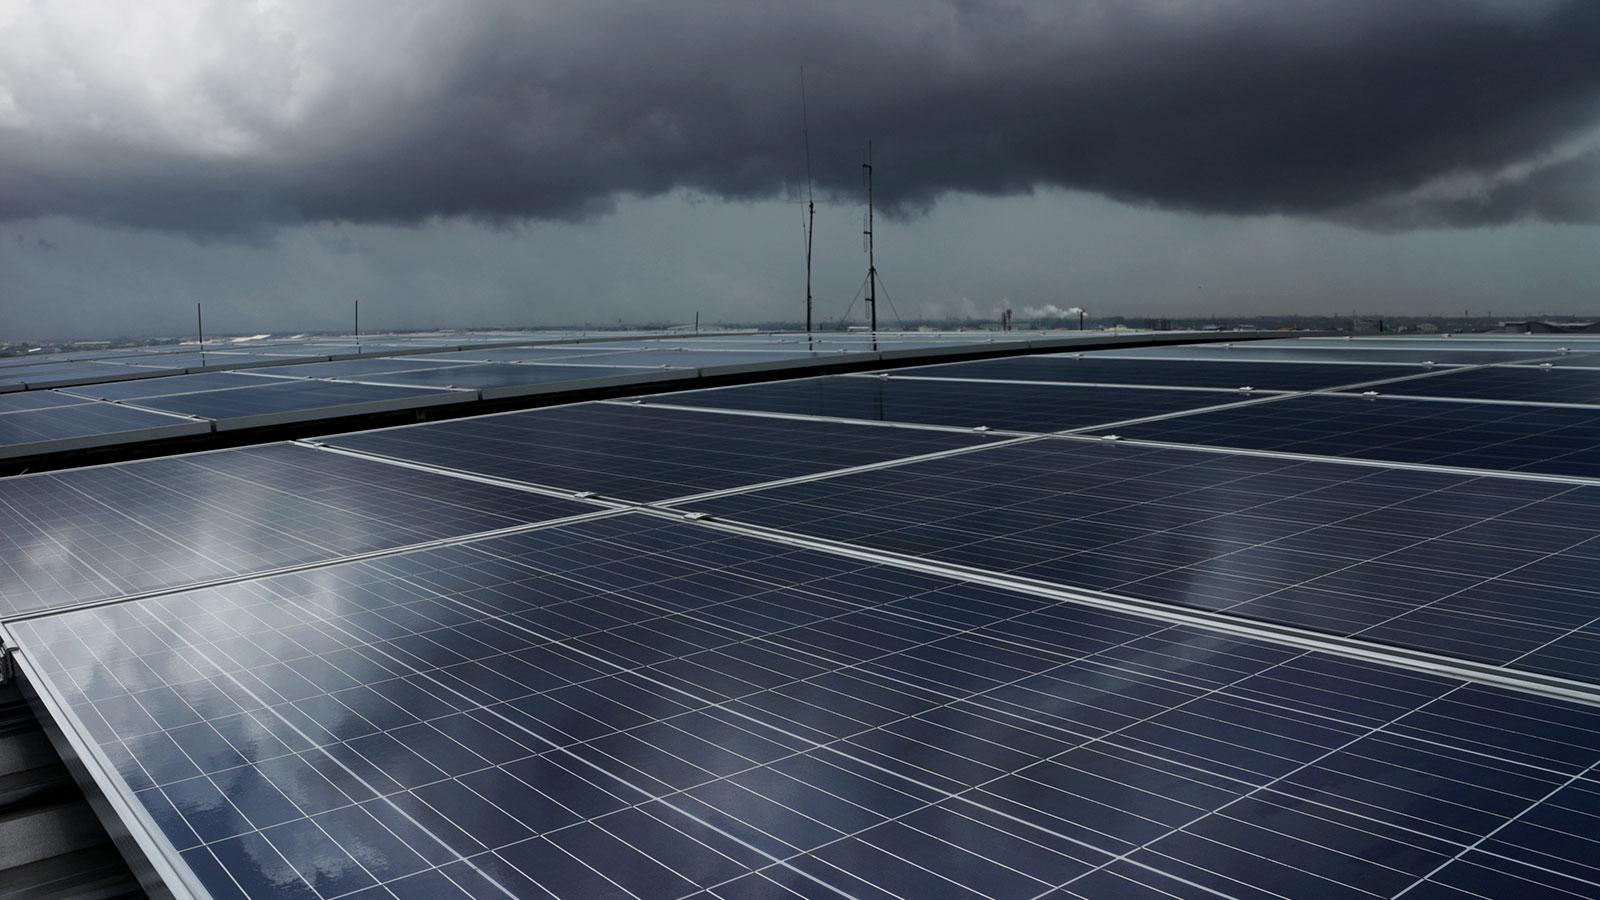 solar-panels-storm